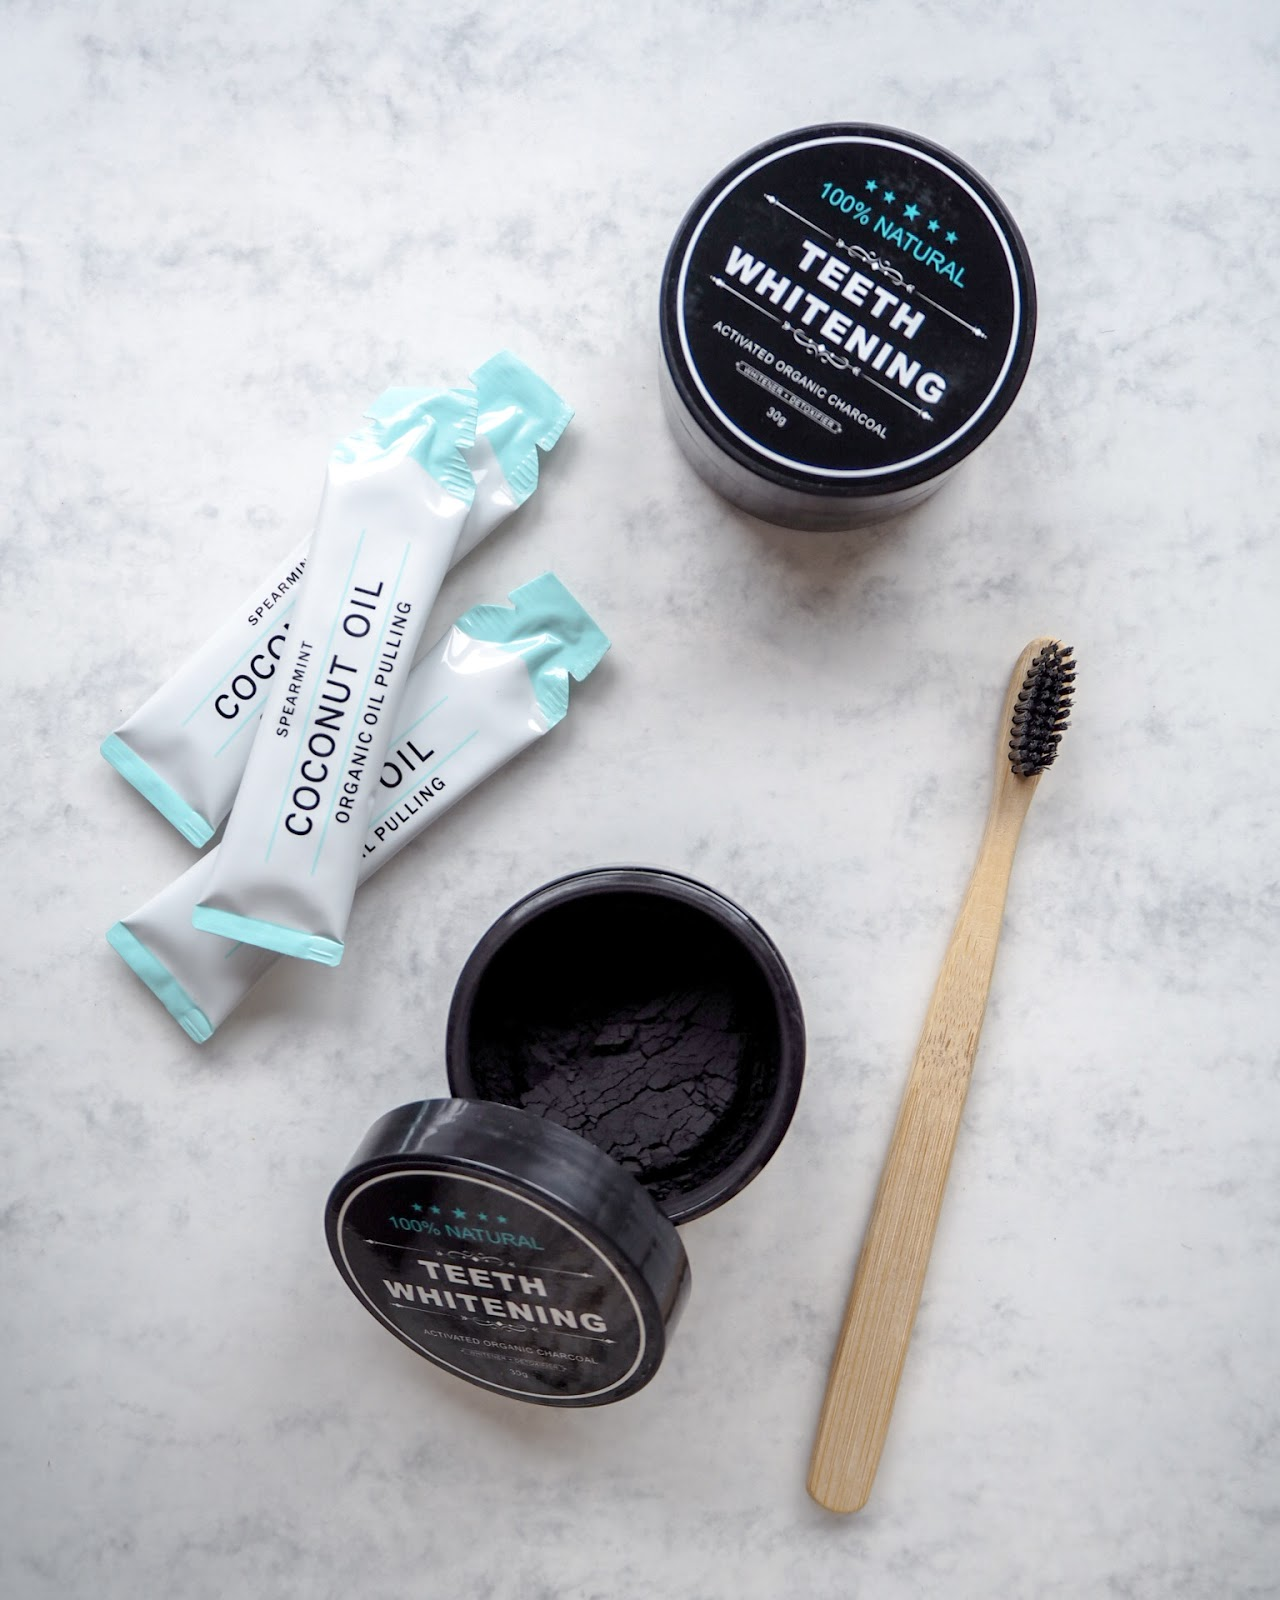 INSTAwhite Essential Teeth Whitening Kit